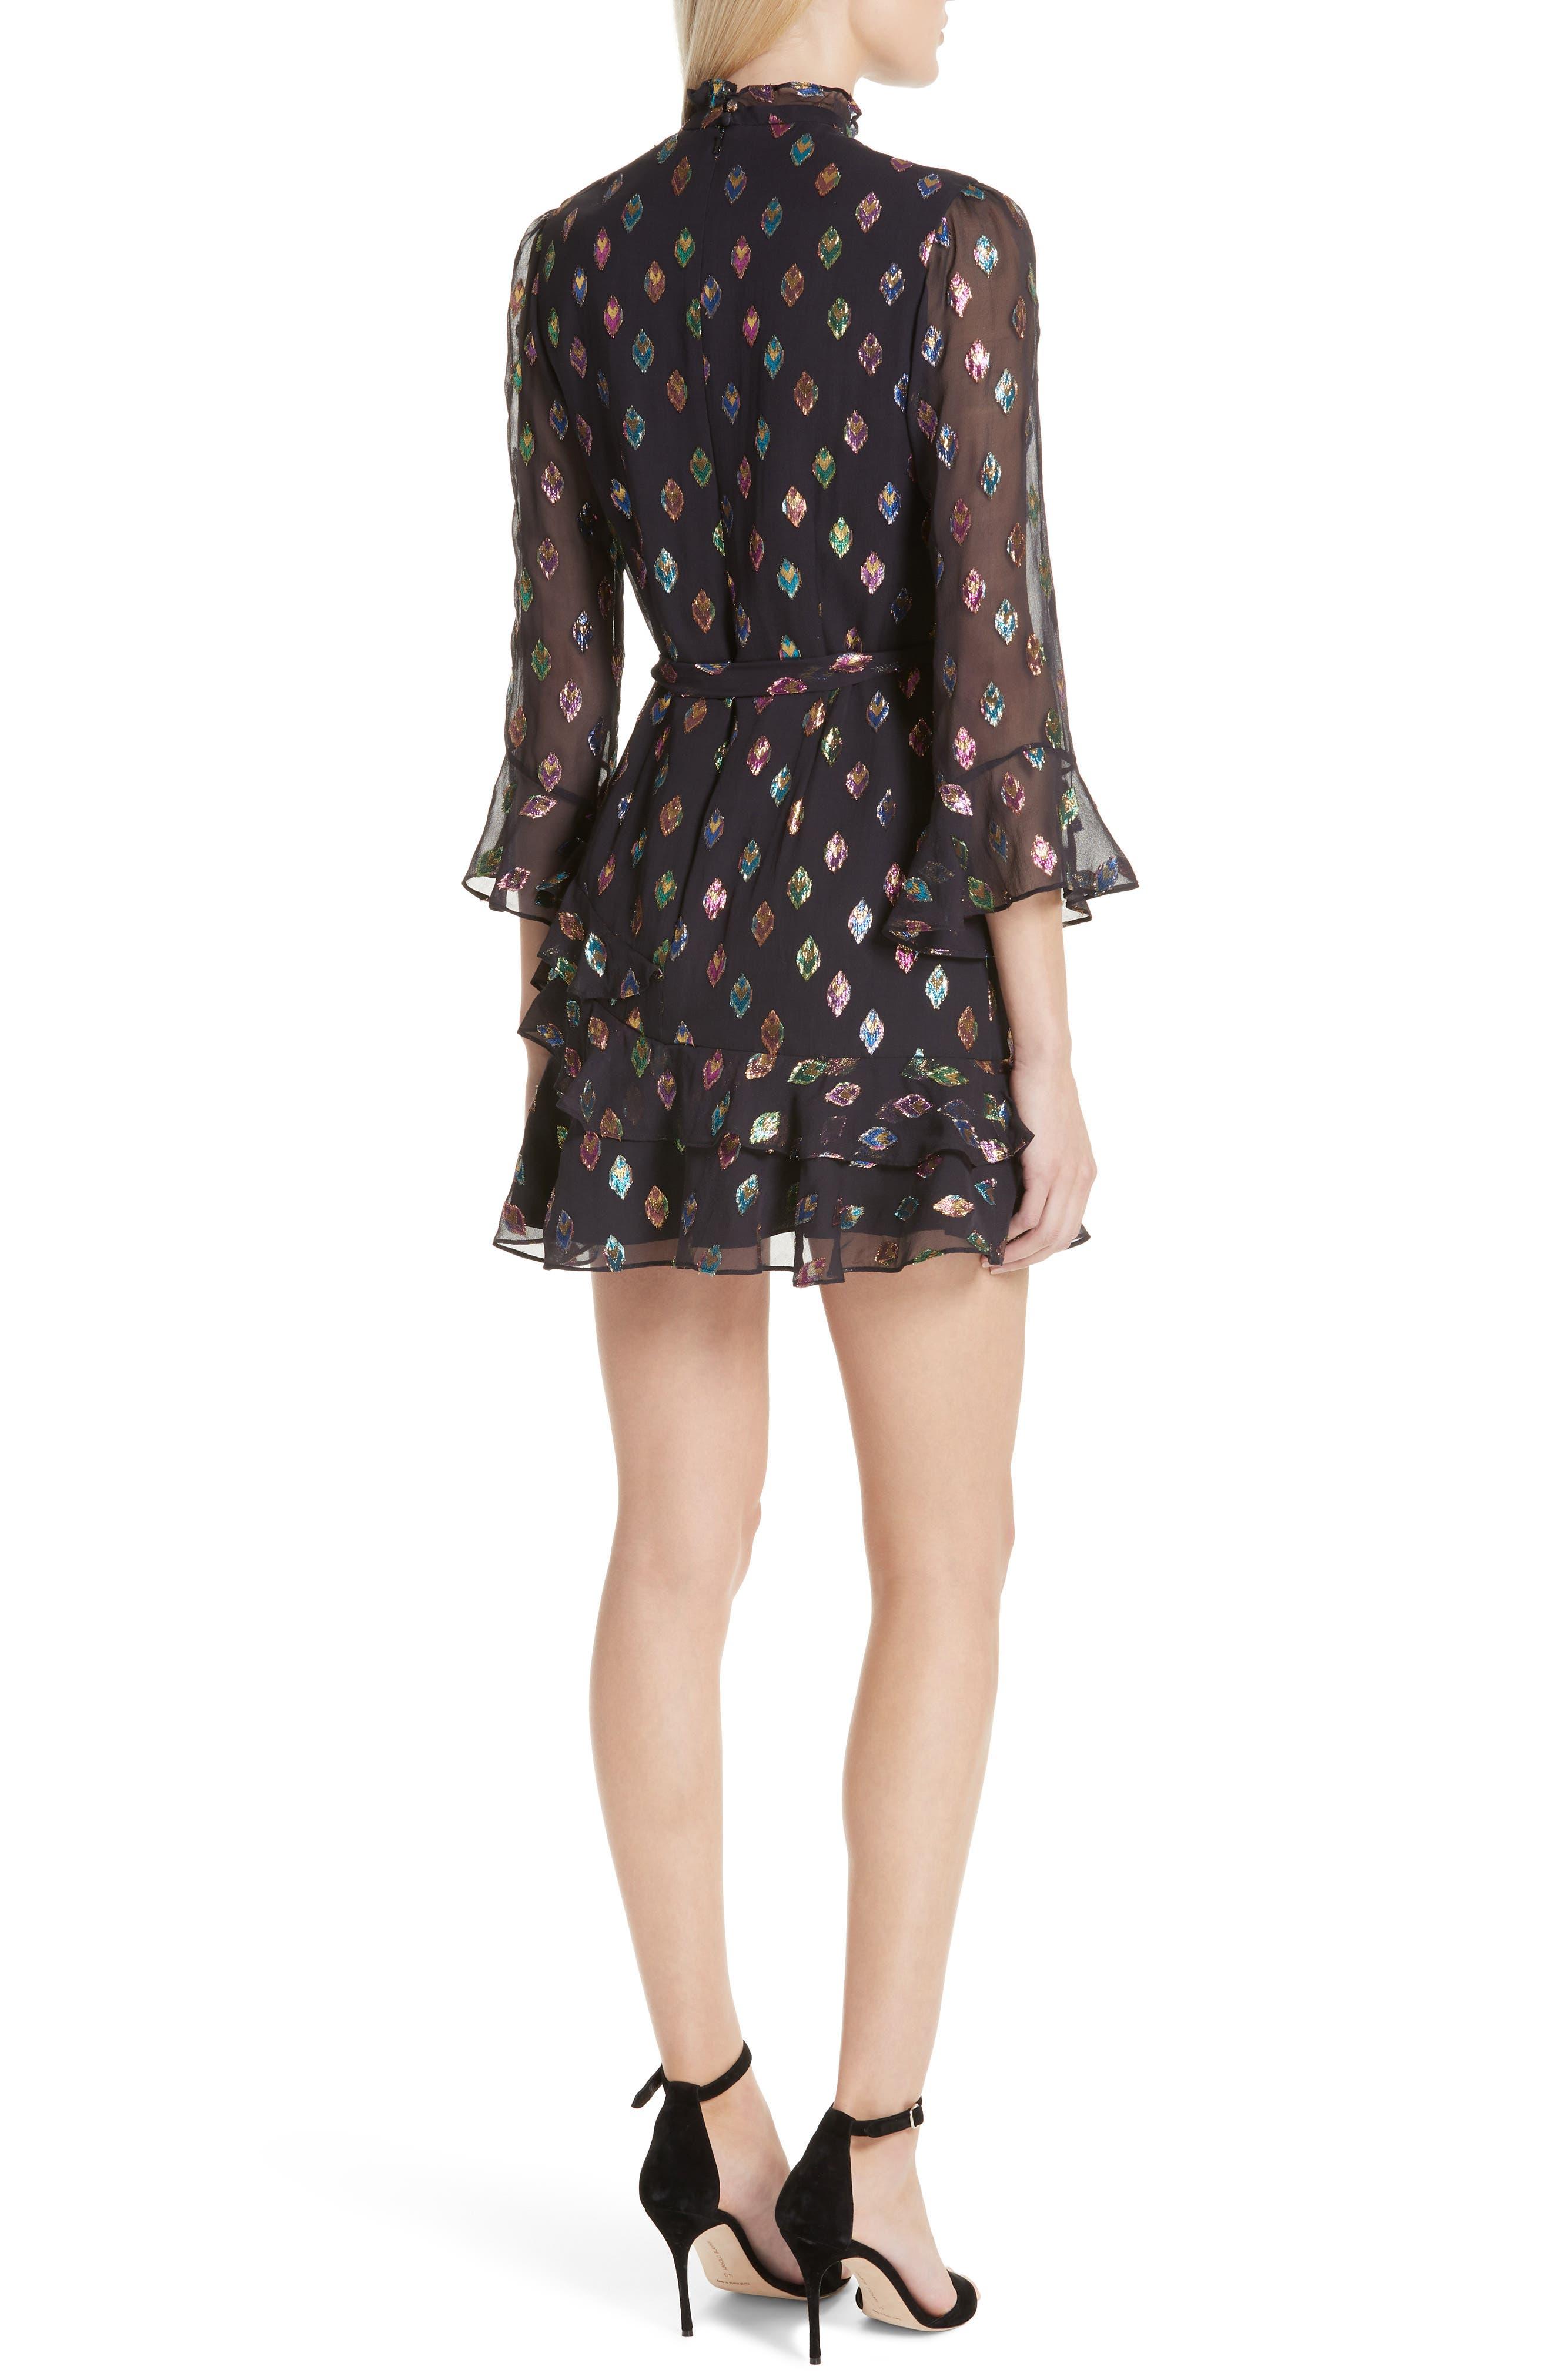 SALONI, Marissa Metallic Fil Coupé Silk Blend Minidress, Alternate thumbnail 2, color, 003